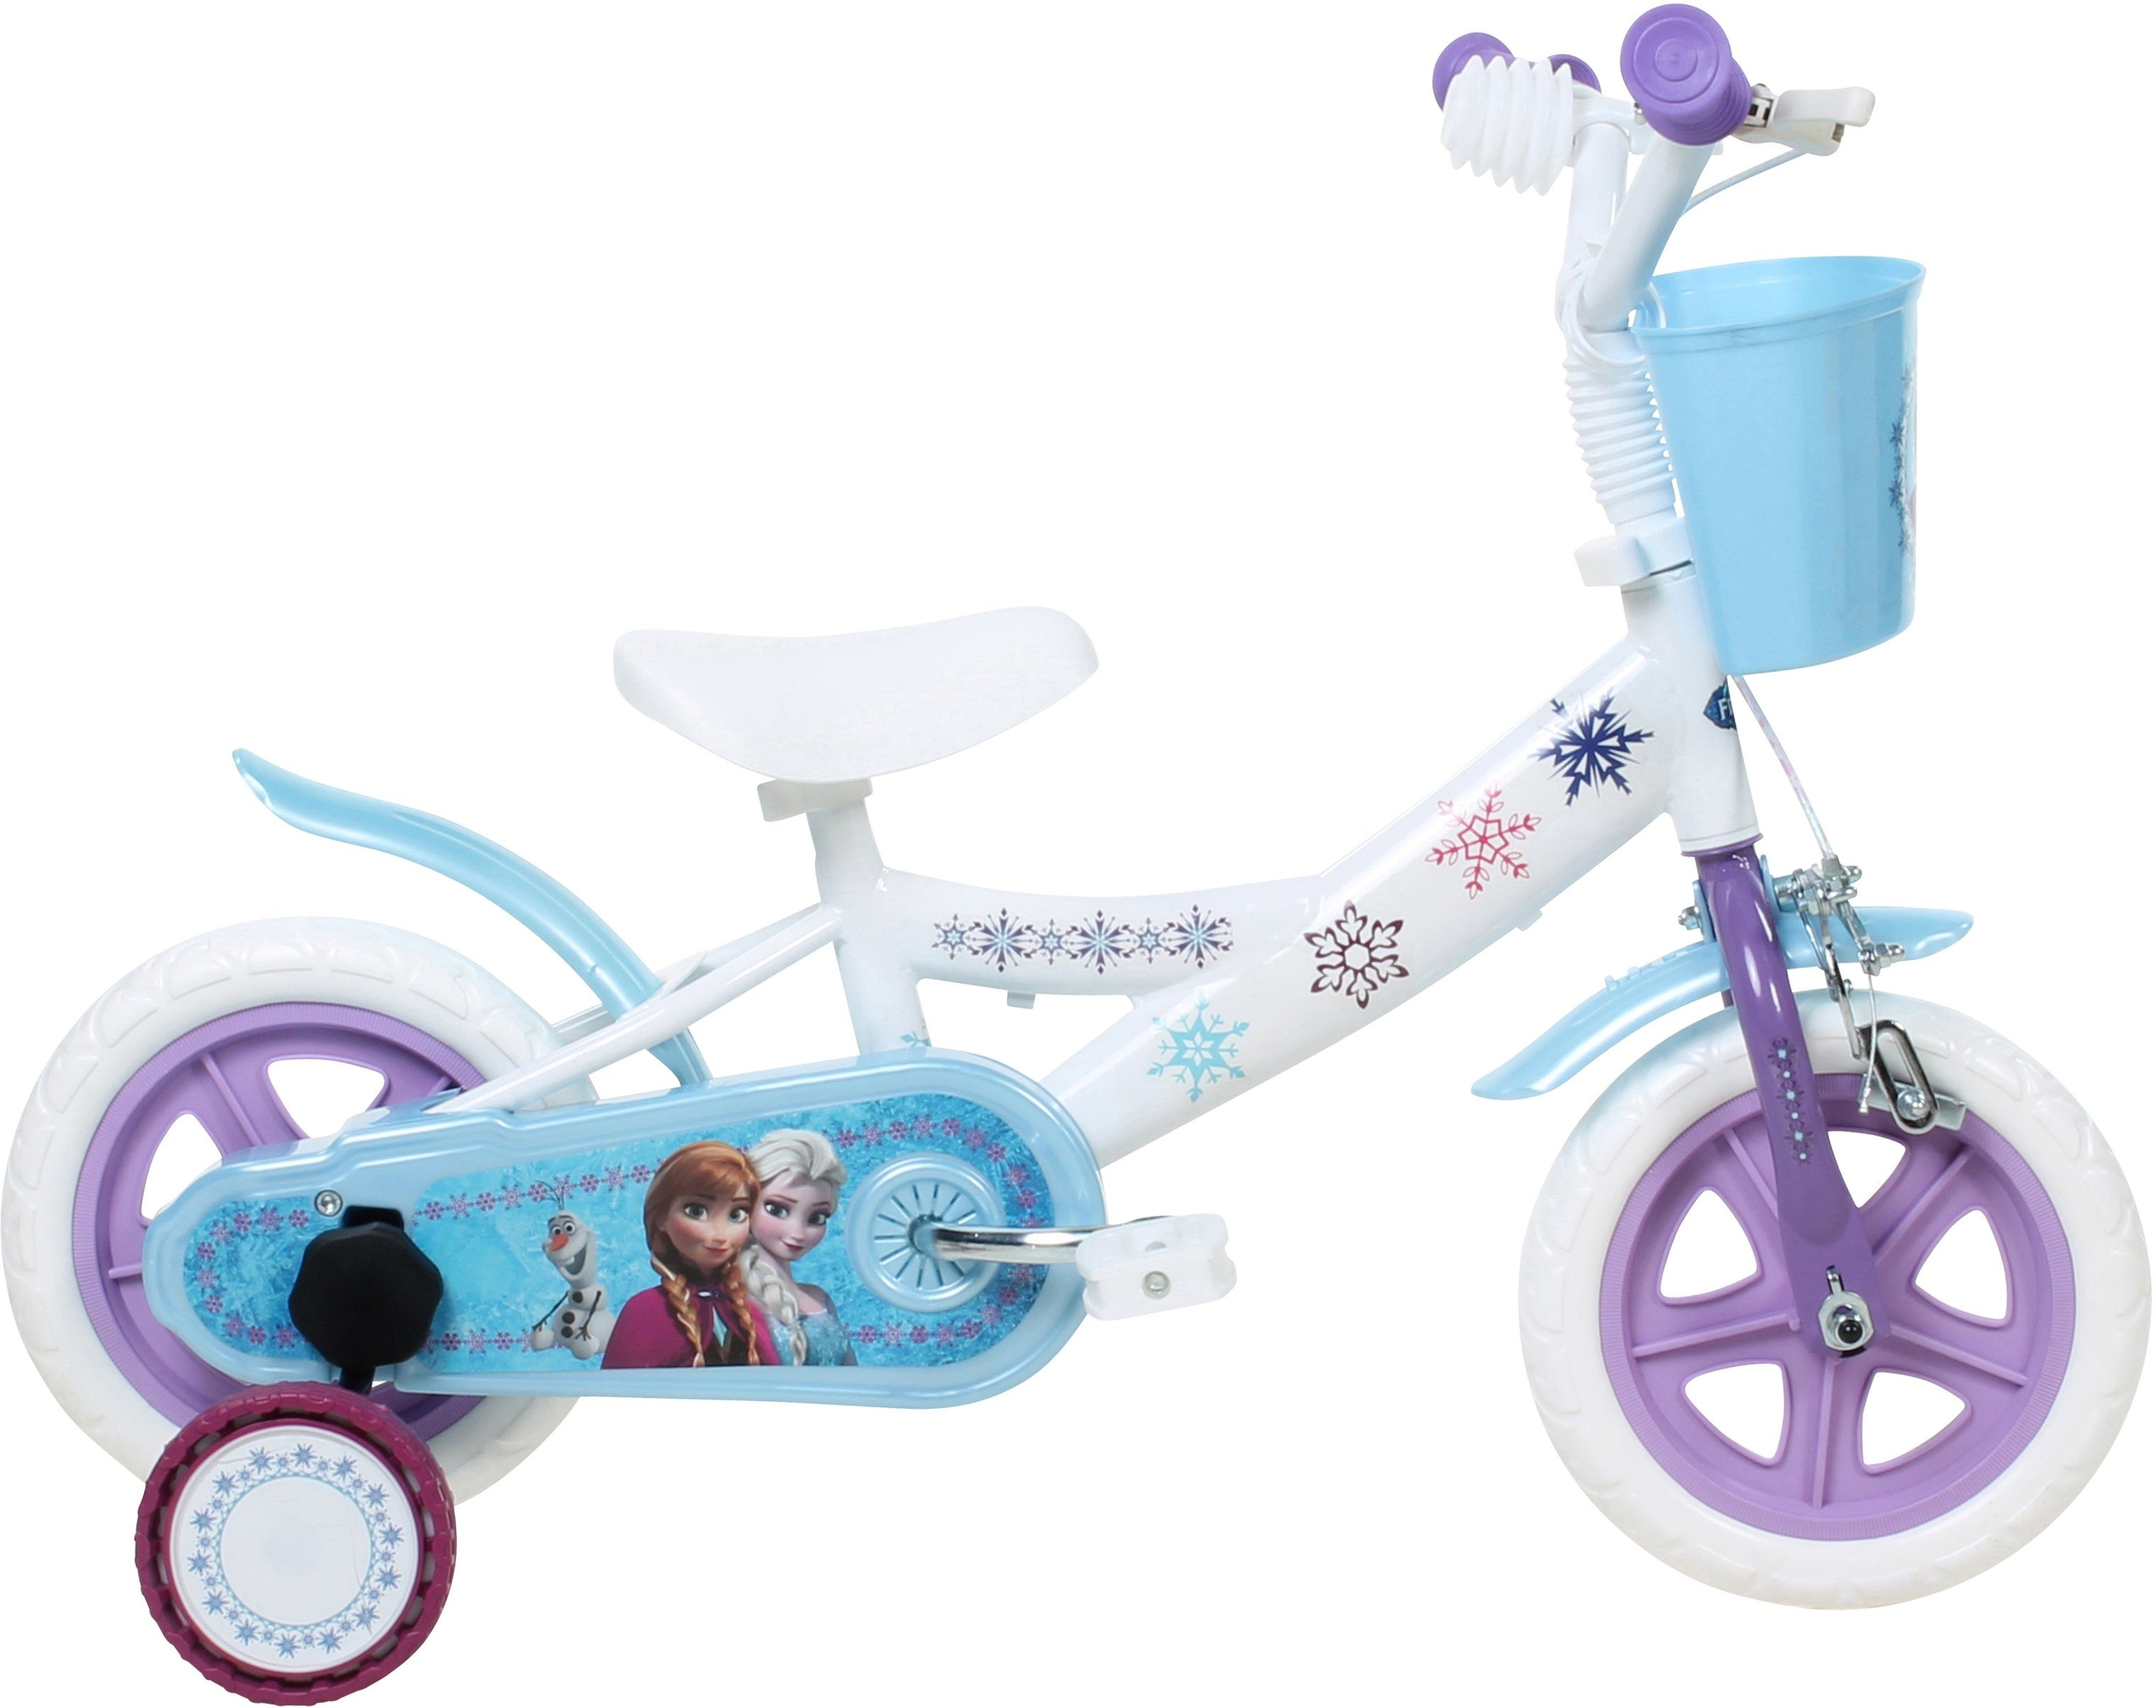 Disney Kinderfahrrad Mädchen, 10 Zoll, U-Brakes, »Frozen«